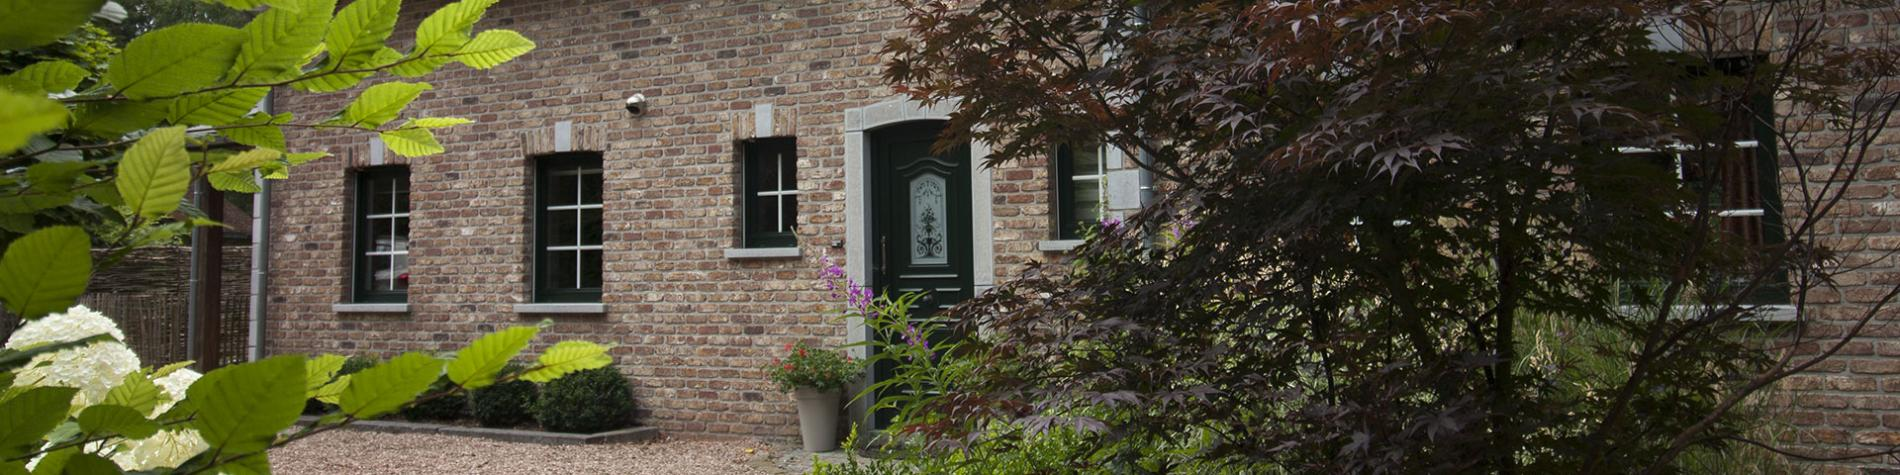 Meublé de vacances Sweet Home Spa - 5 chambres. 3 salles de bains - Sauna - Grand garage - Parking privé - Jardin - Terrasse